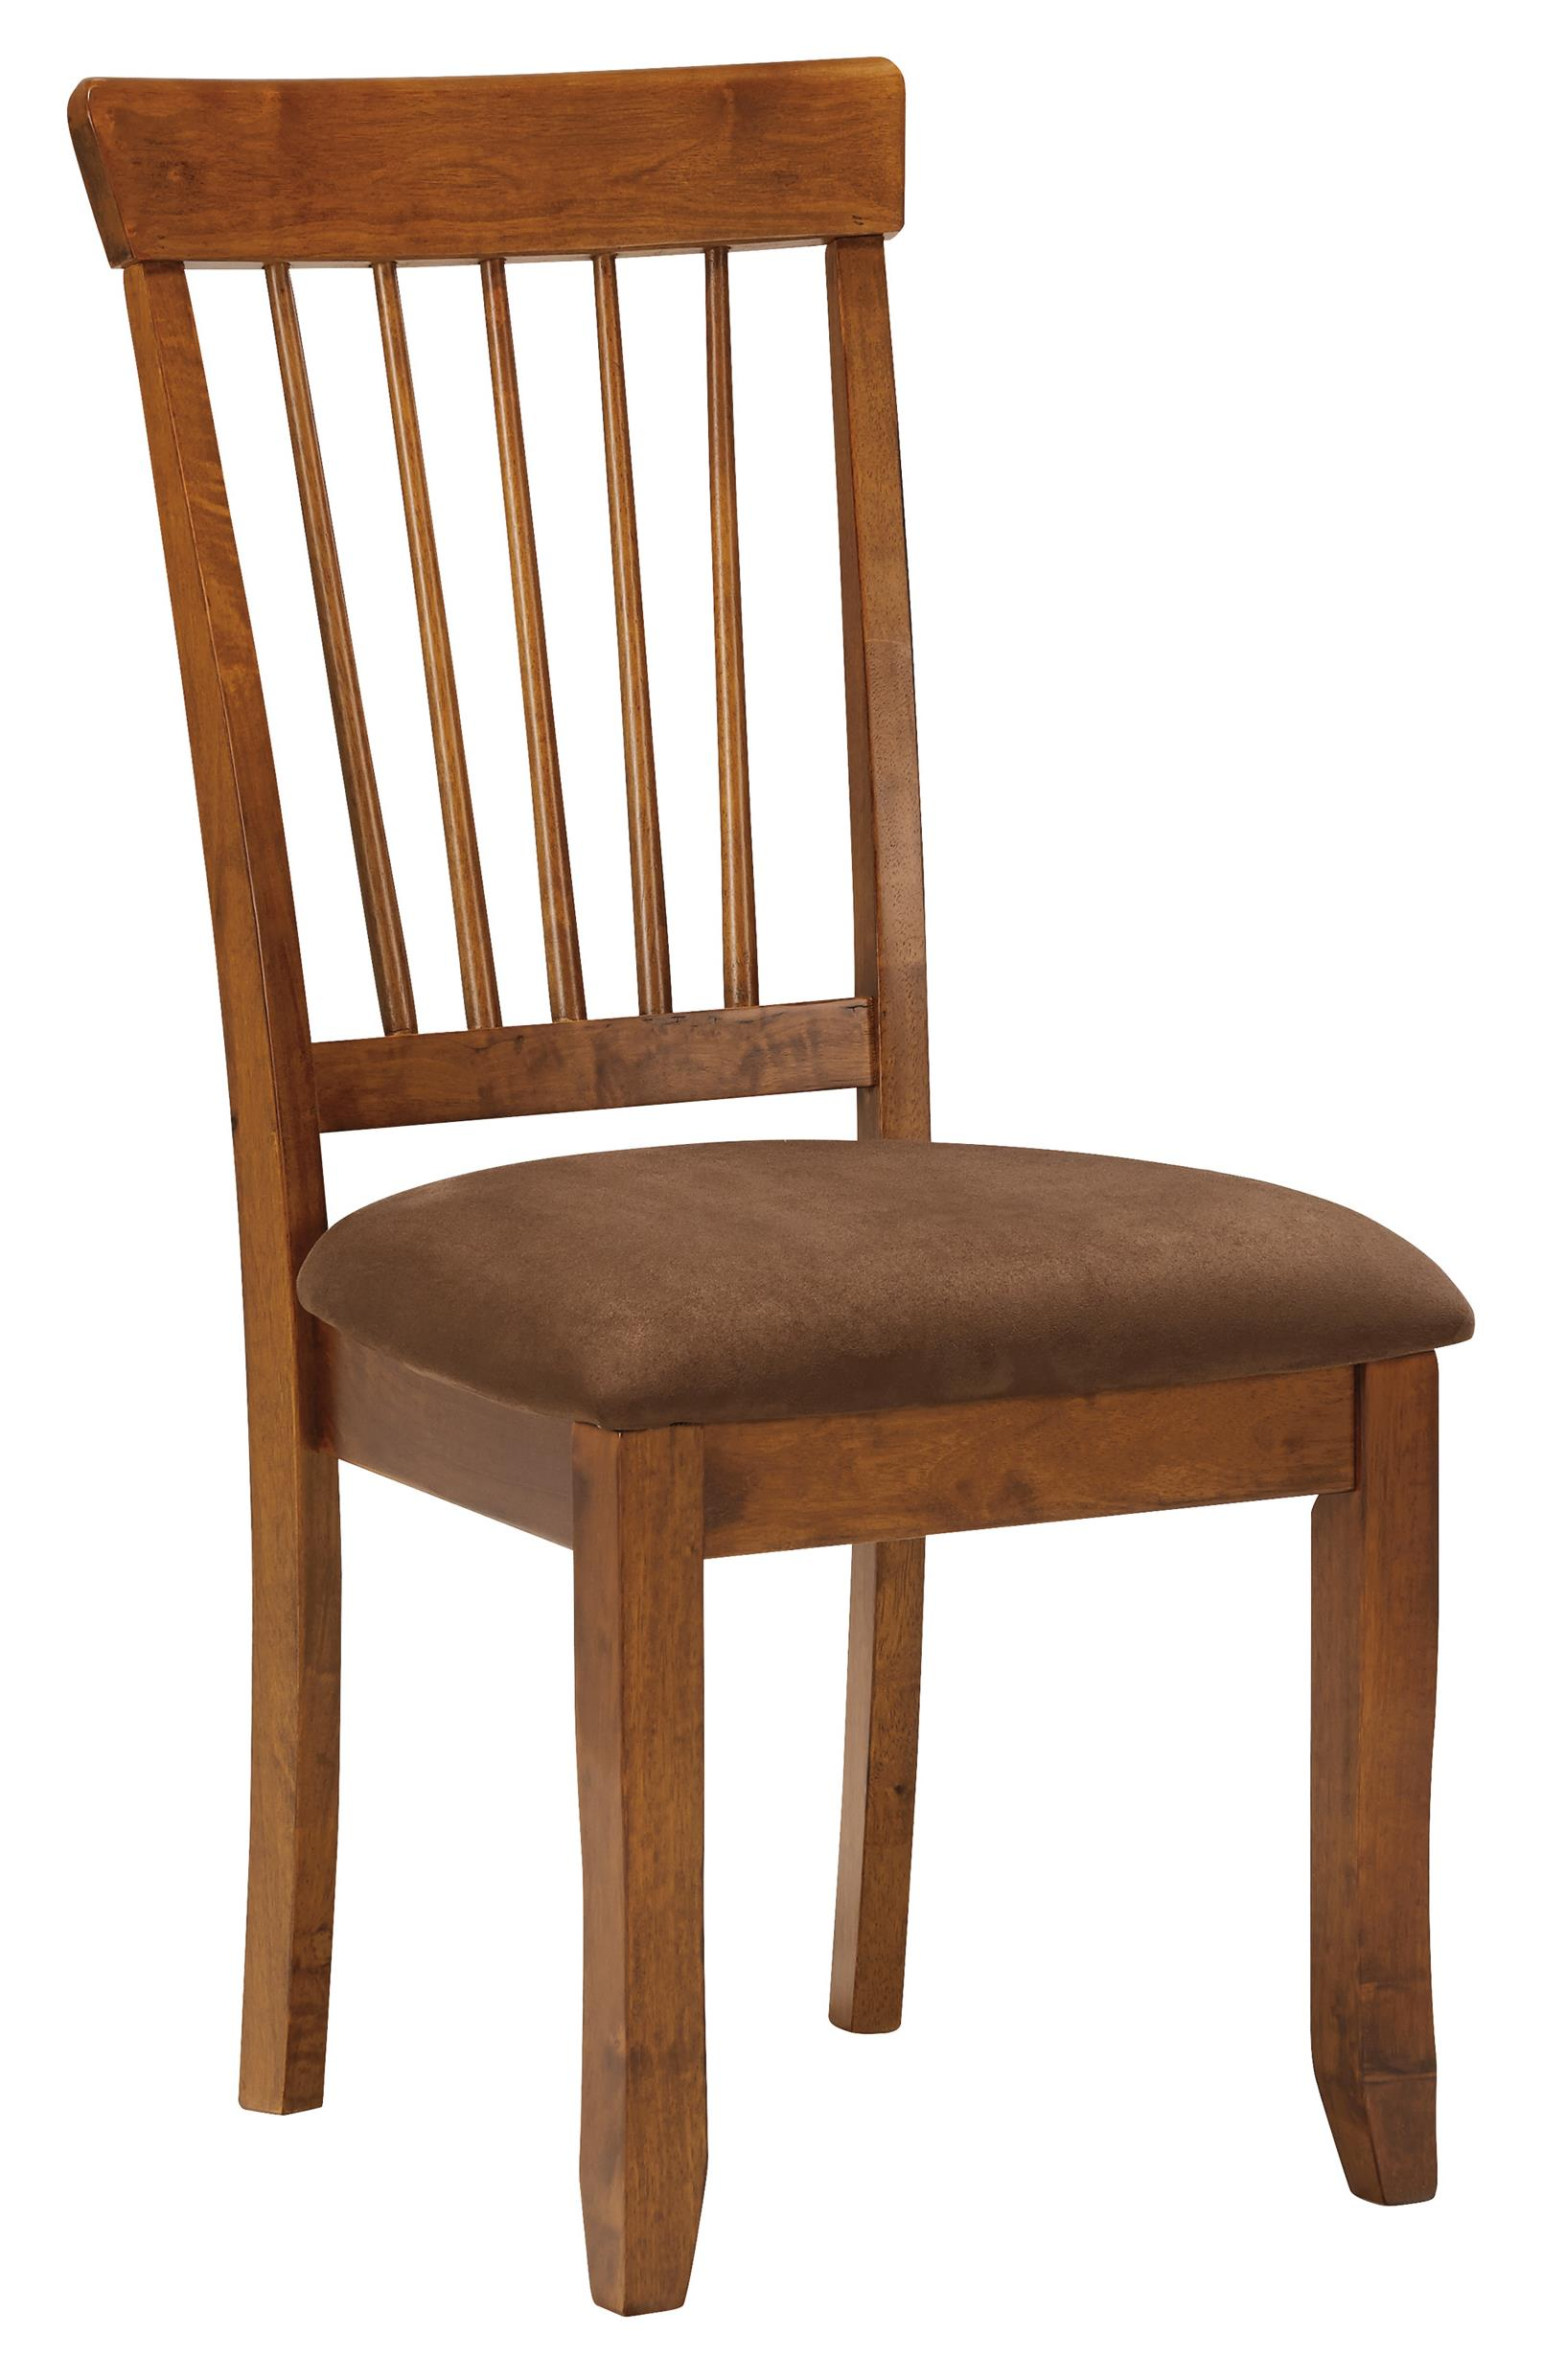 Ashley Furniture Berringer 5 Piece 36x60 Table amp Chair Set  : products2Fashleyfurniture2Fcolor2Fberringerd199 252B4x01 b3 from www.dunkandbright.com size 1610 x 2484 jpeg 225kB